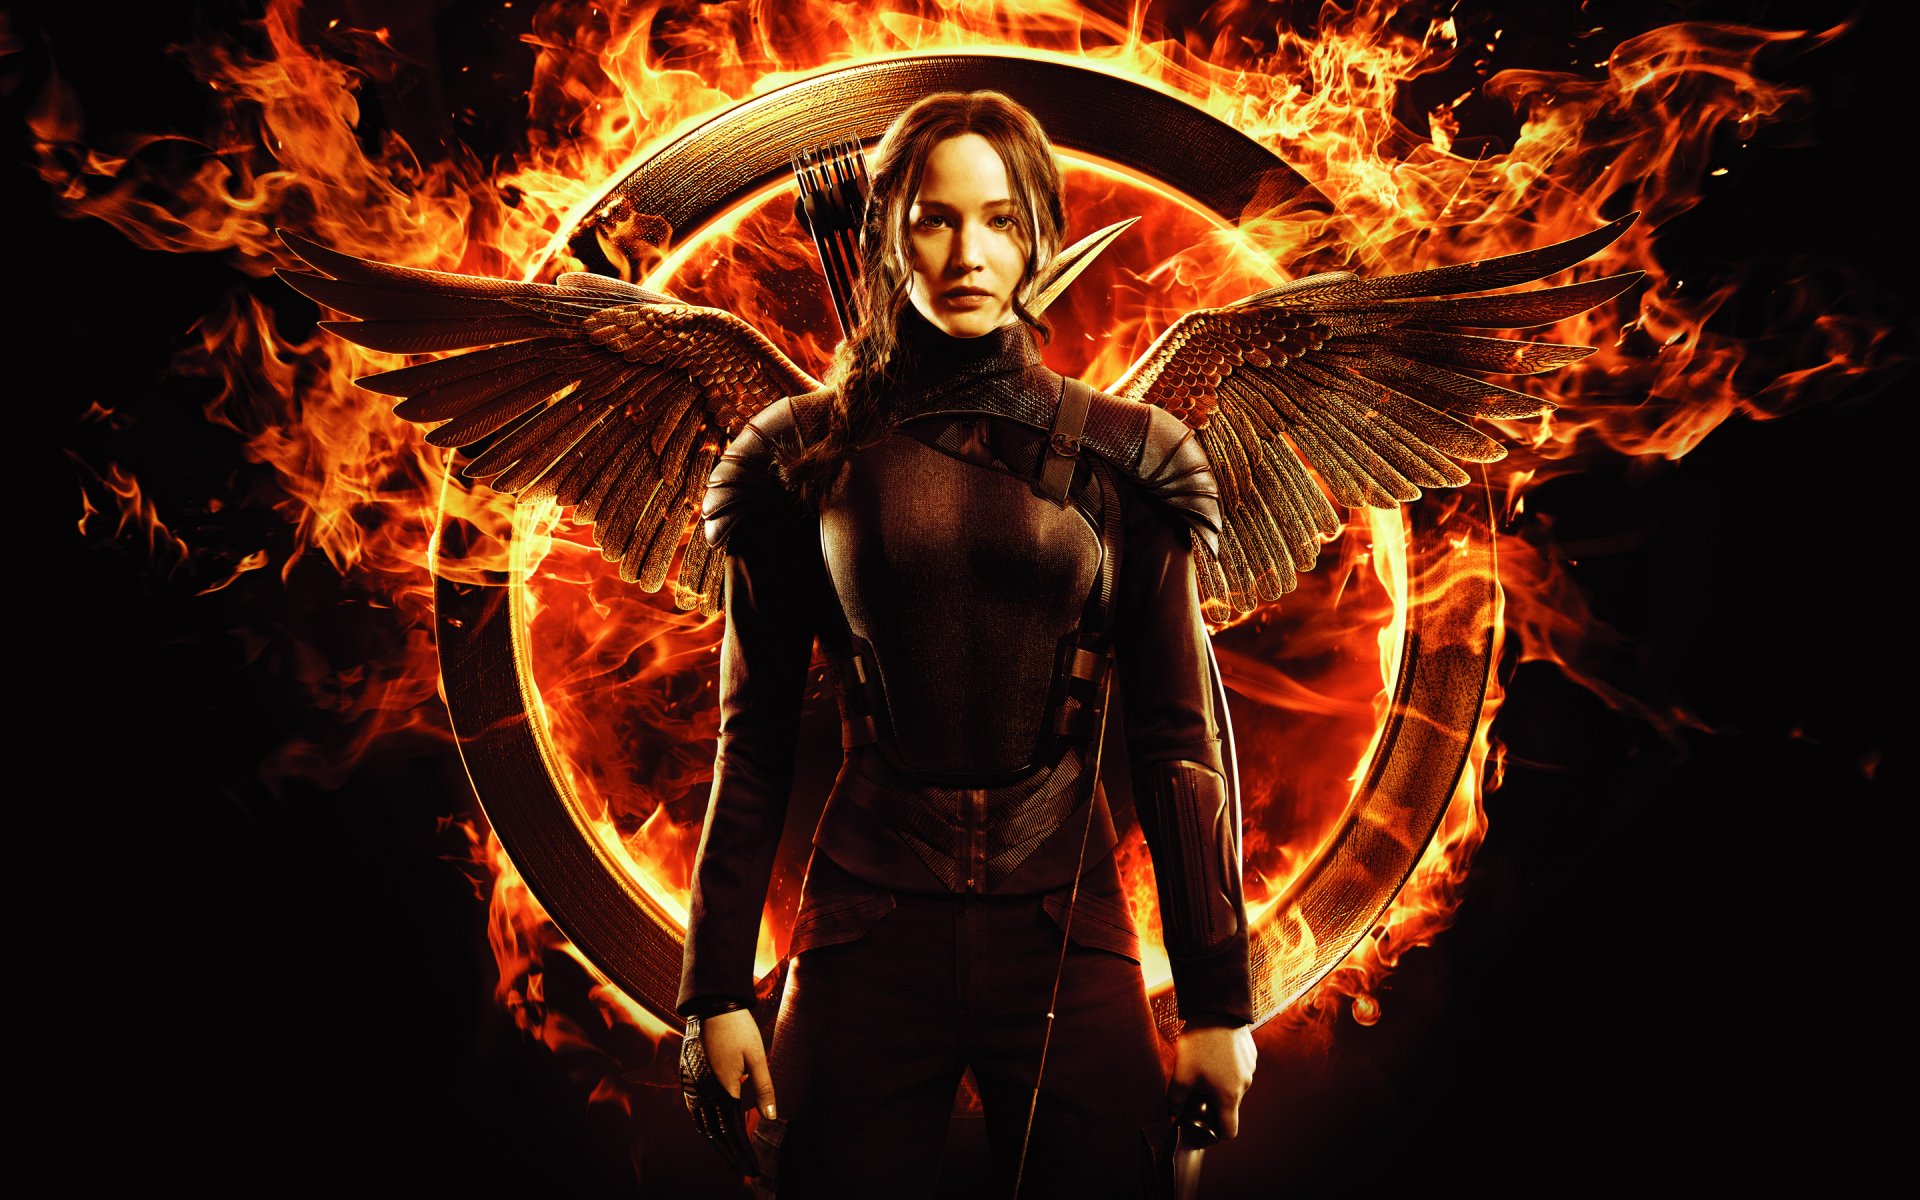 Fondos De Pantalla De Quikis: Fondos De Los Juegos Del Hambre, The Hunger Games Wallpapers